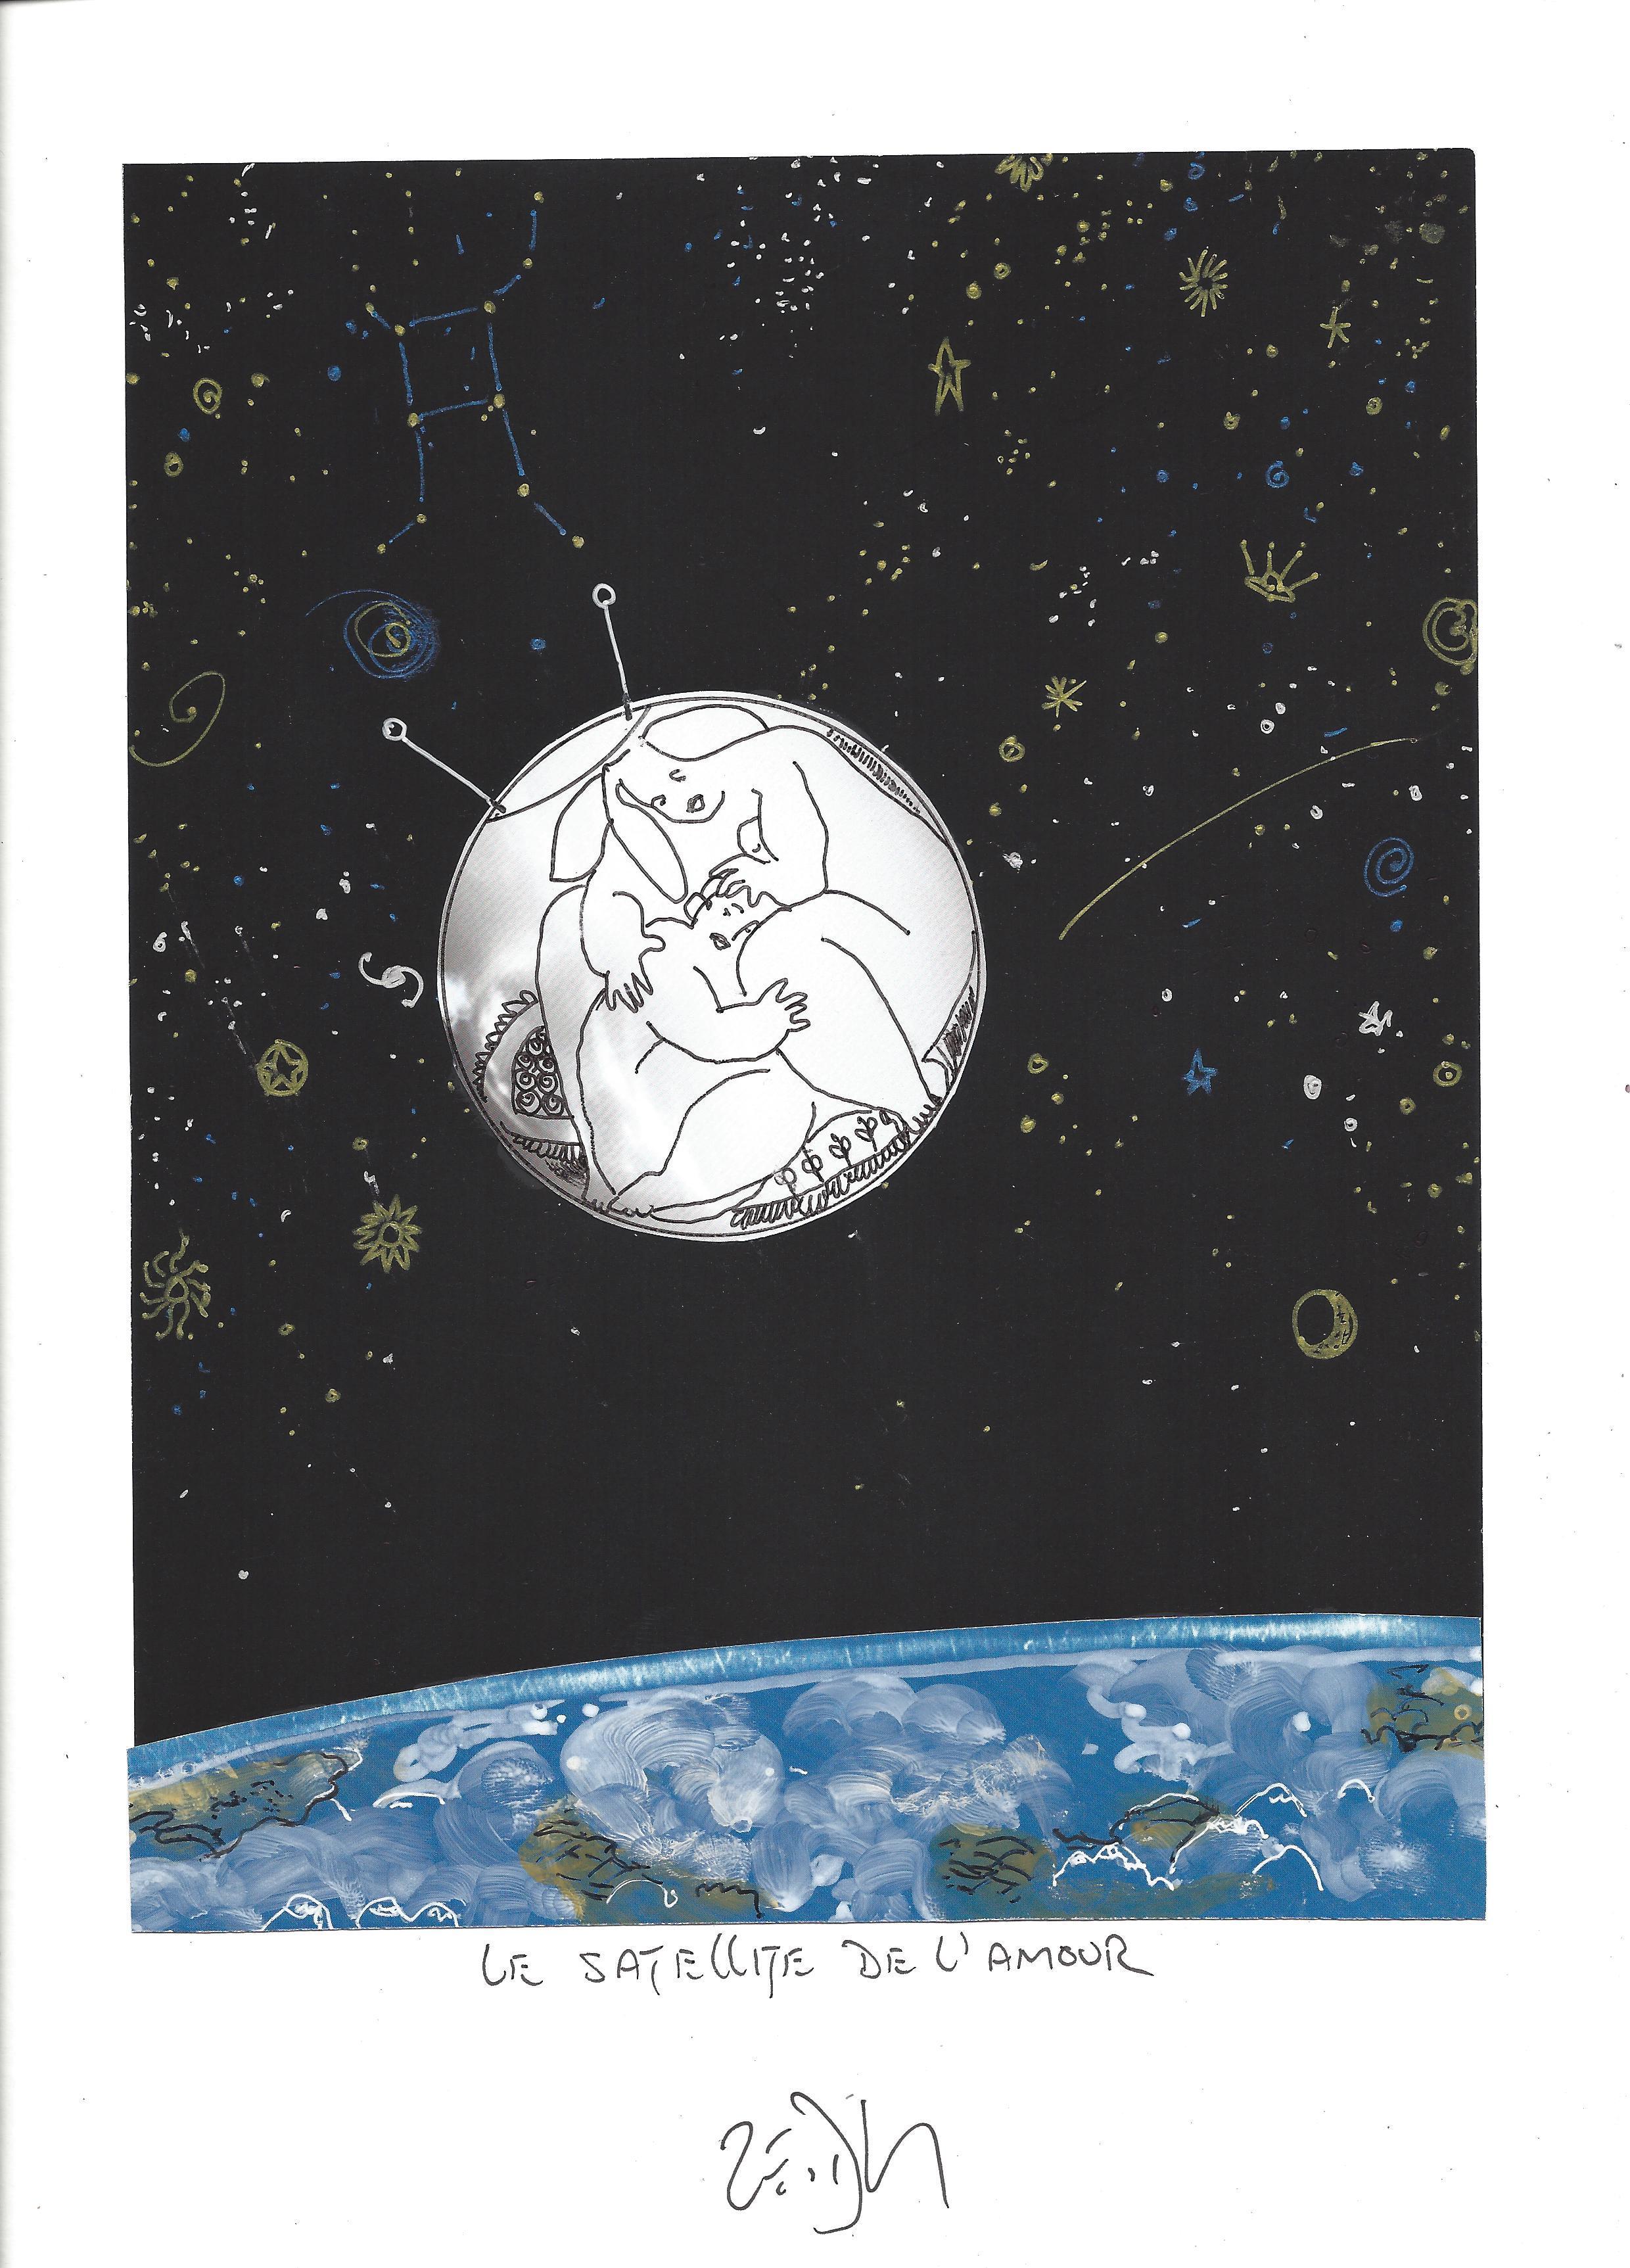 « Satellite of love – Le satellite de l'amour »